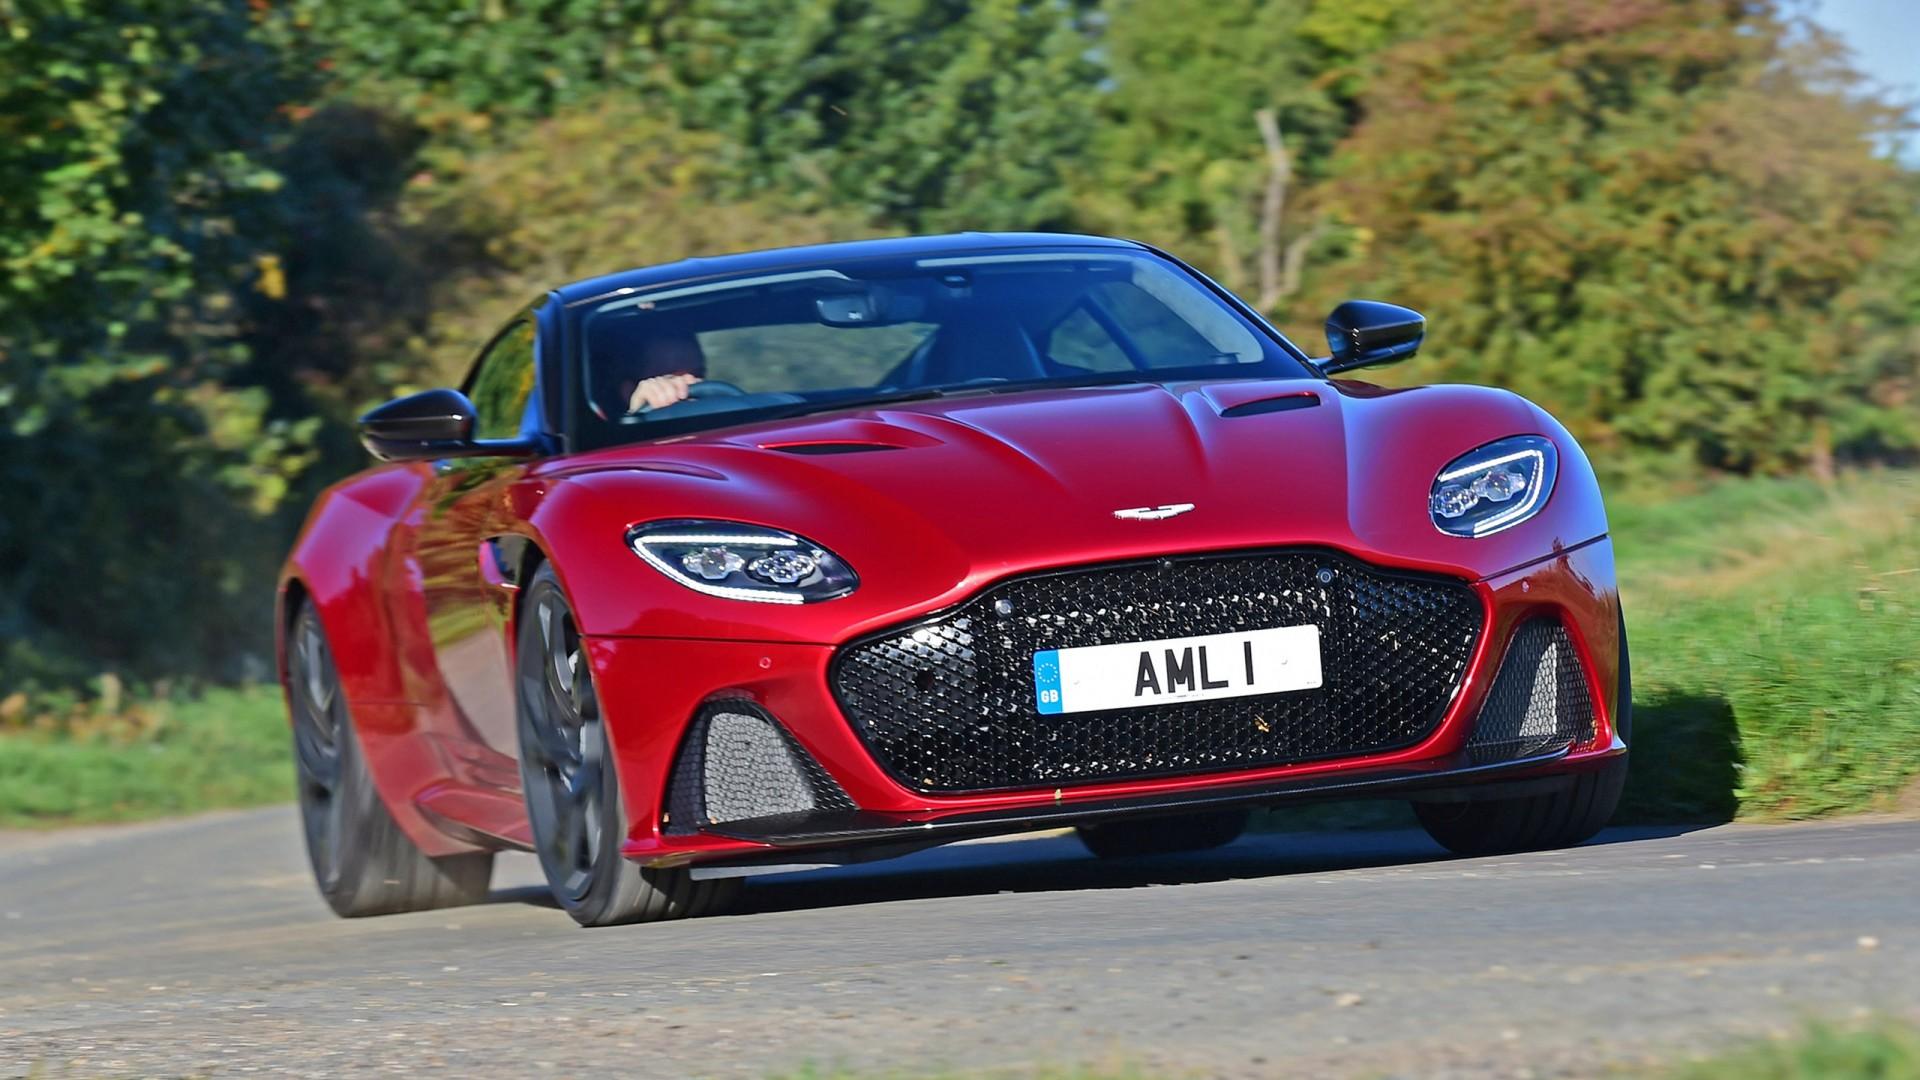 Aston Martin Dbs Superleggera 2019 Wallpaper Hd Car